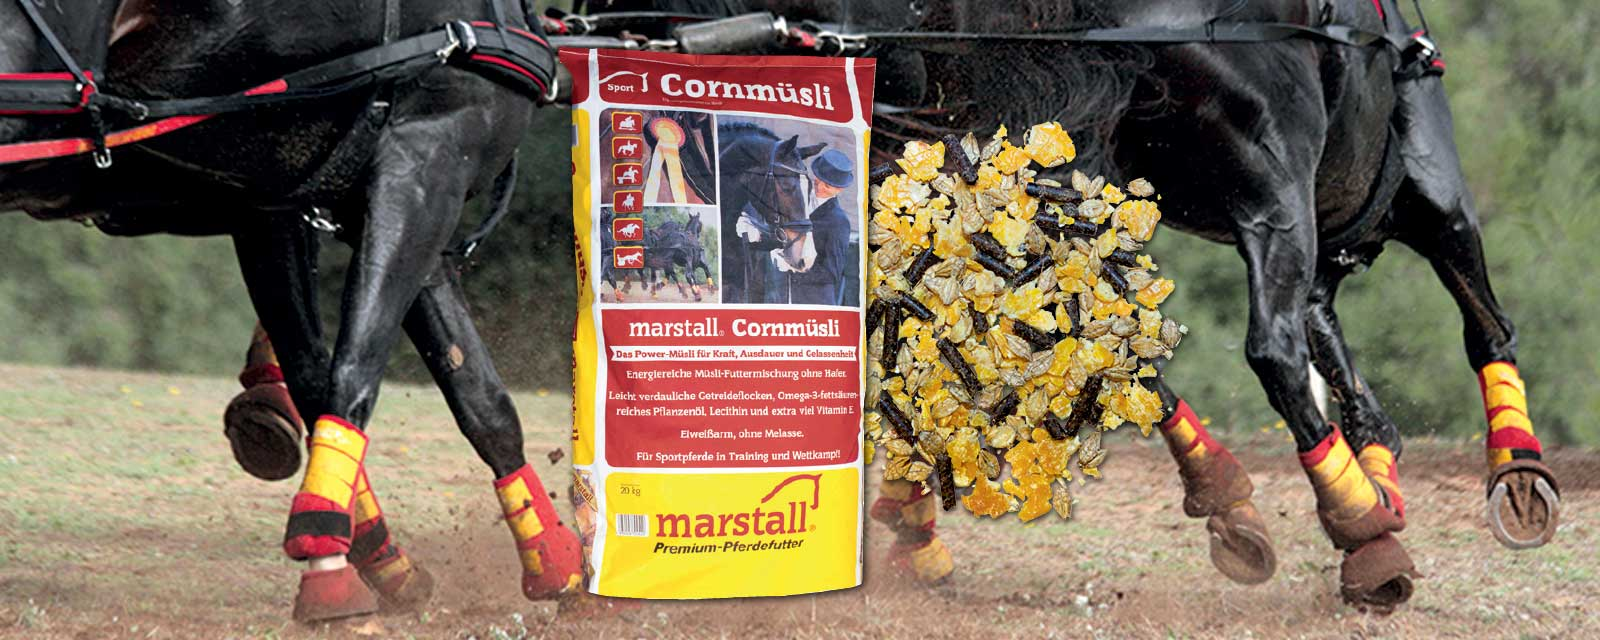 marstall Sport-Linie Cornmüsli